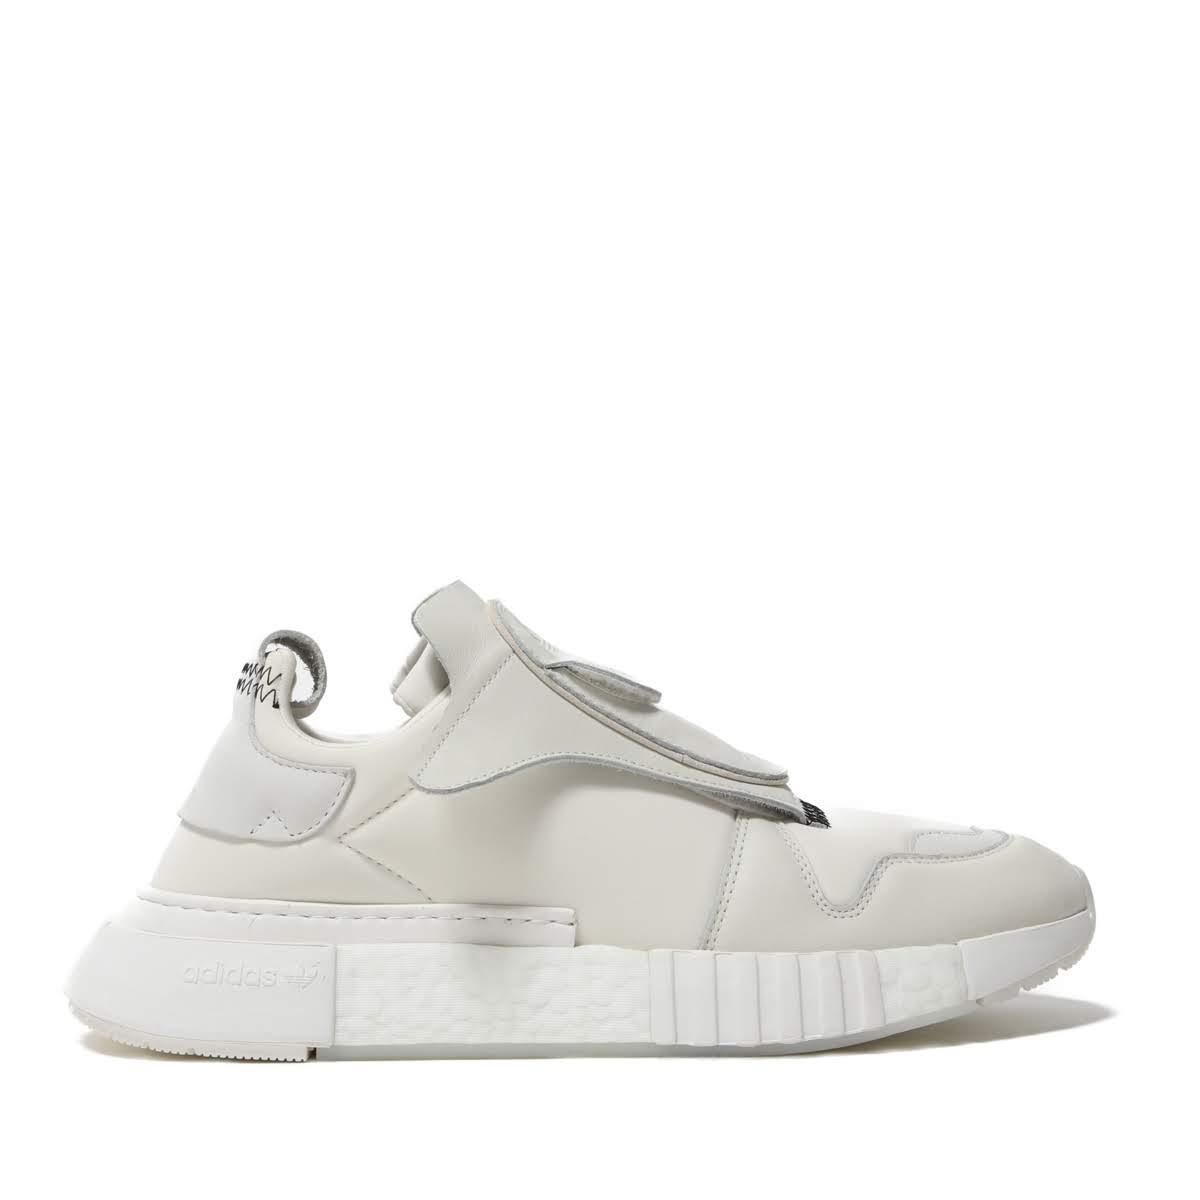 adidas Originals FUTUREPACER(CLOUD WHITE/CLOUD WHITE/CLOUD WHITE)(アディダスオリジナルス フューチャーペーサー)【メンズ】【スニーカー】【19SS-I】